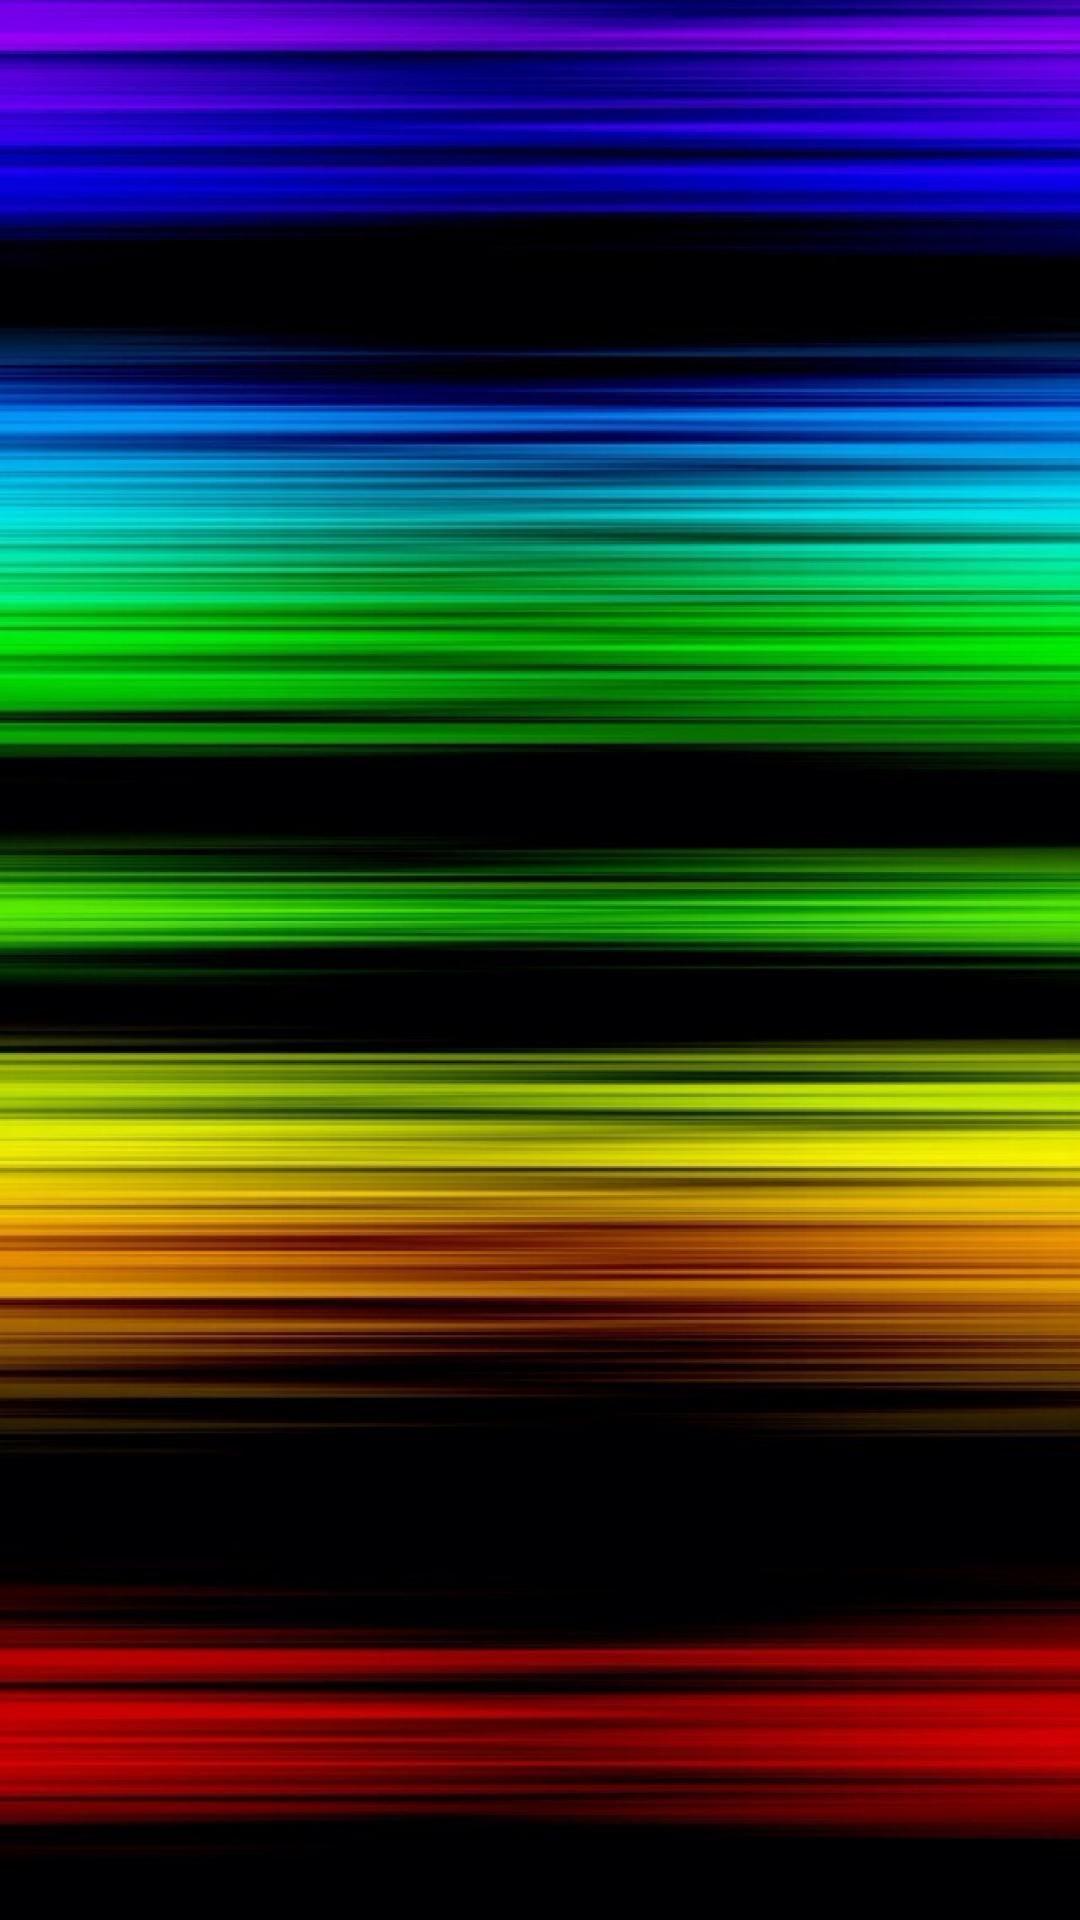 The iPhone Retina Wallpaper I like! Wallpaper iphone